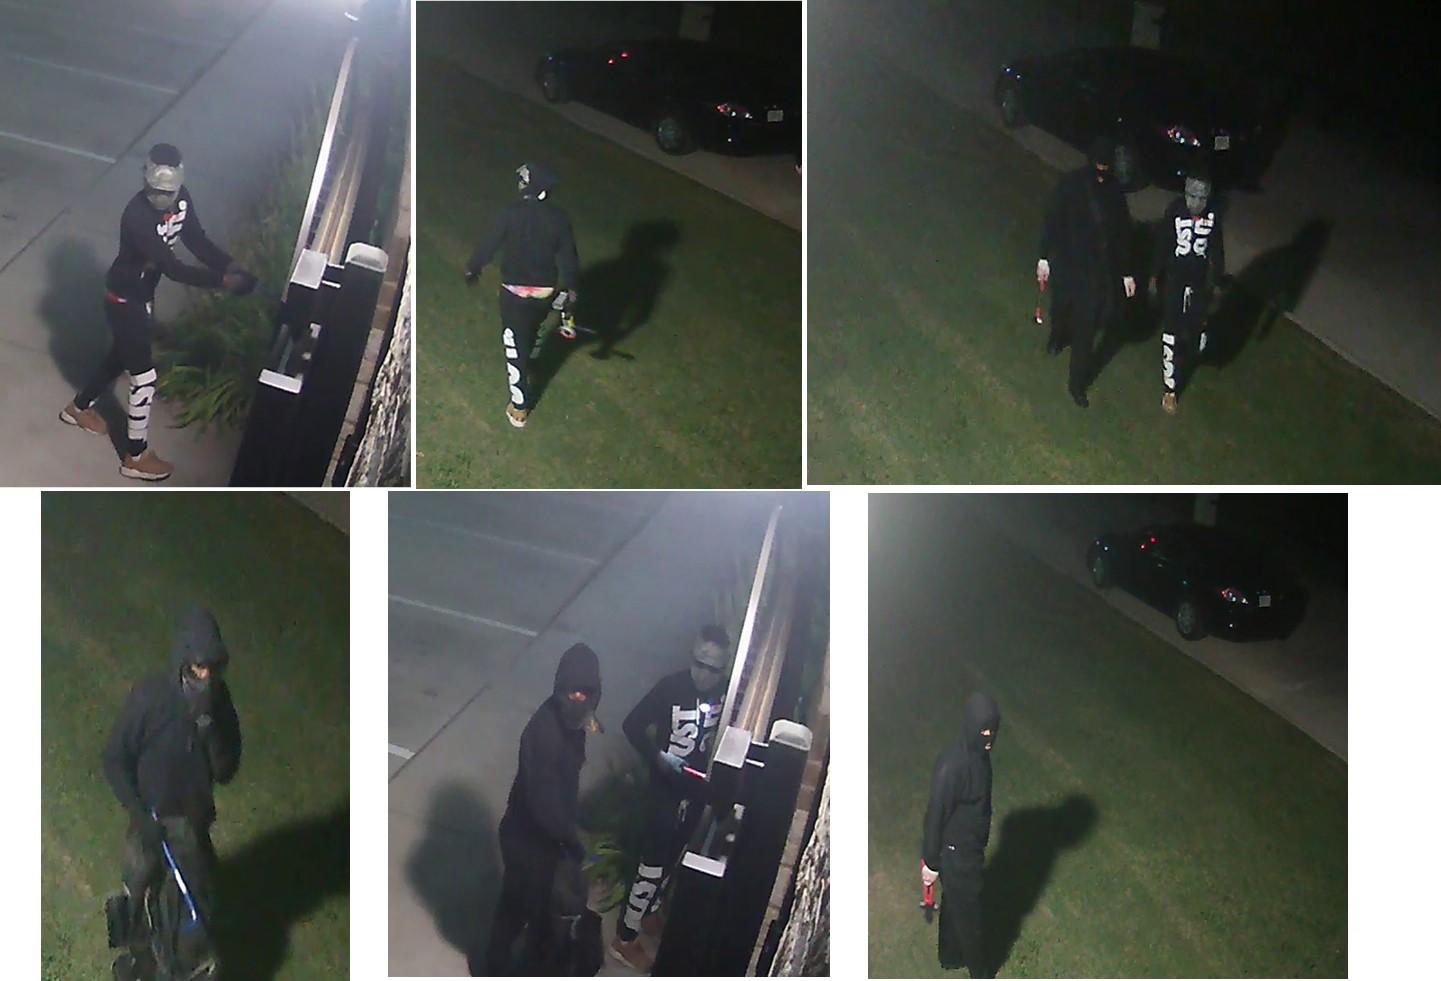 Tres sospechosos enmascarados, vestidos de negro, querían por irrumpir en Marksmen Firearms